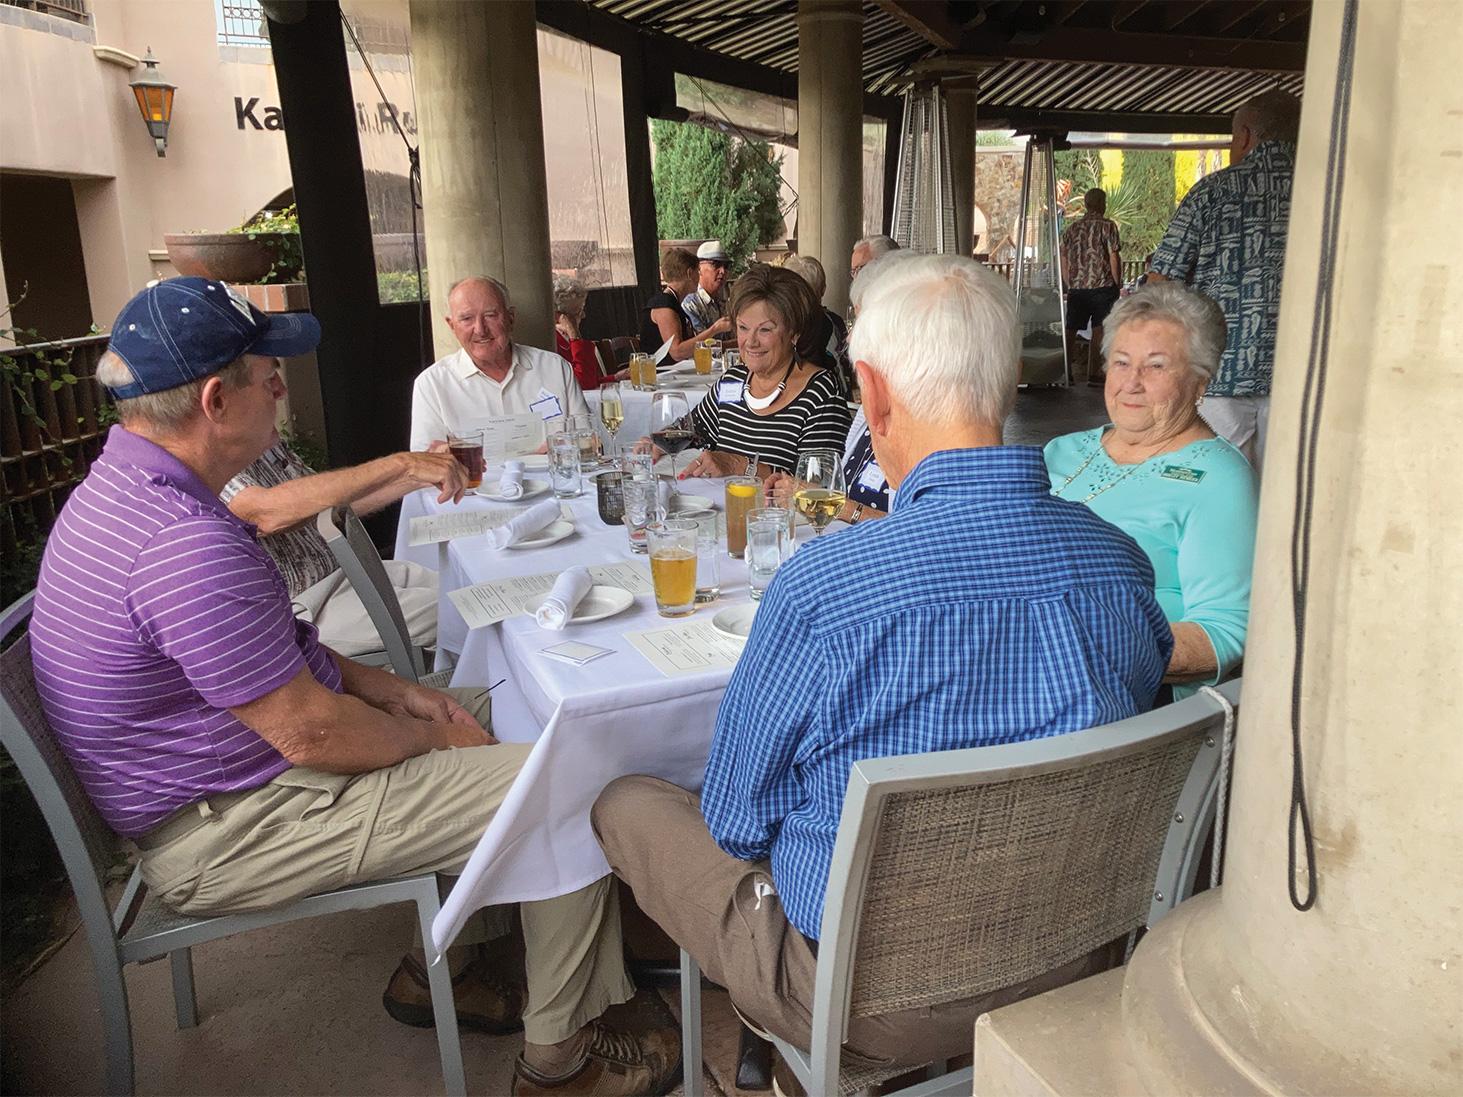 Residents enjoying a Dine Around dinner on the patio at Tavolino Ristorante Italiano.